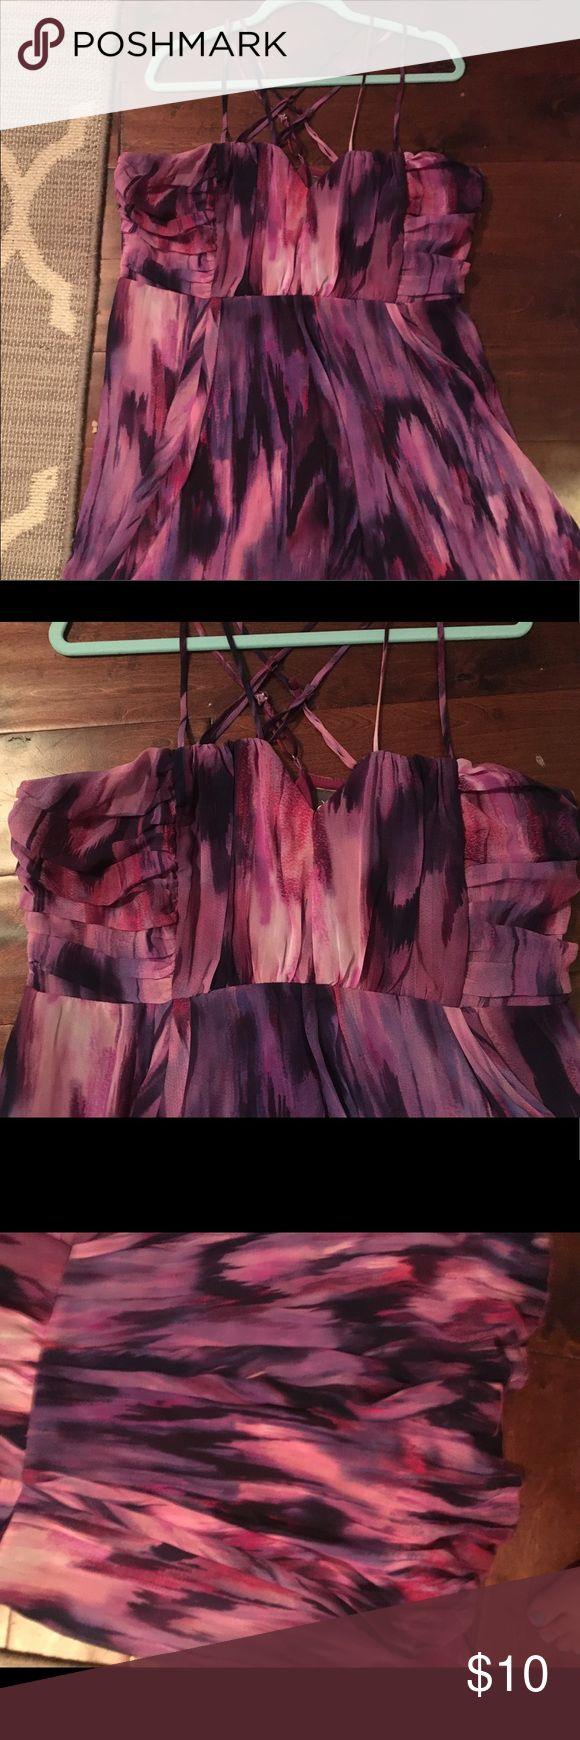 Purple Party Dress Super fun & flirty Purple Party Dress. Empire Waist. Strappy top. Dots Size 20 Dots Dresses